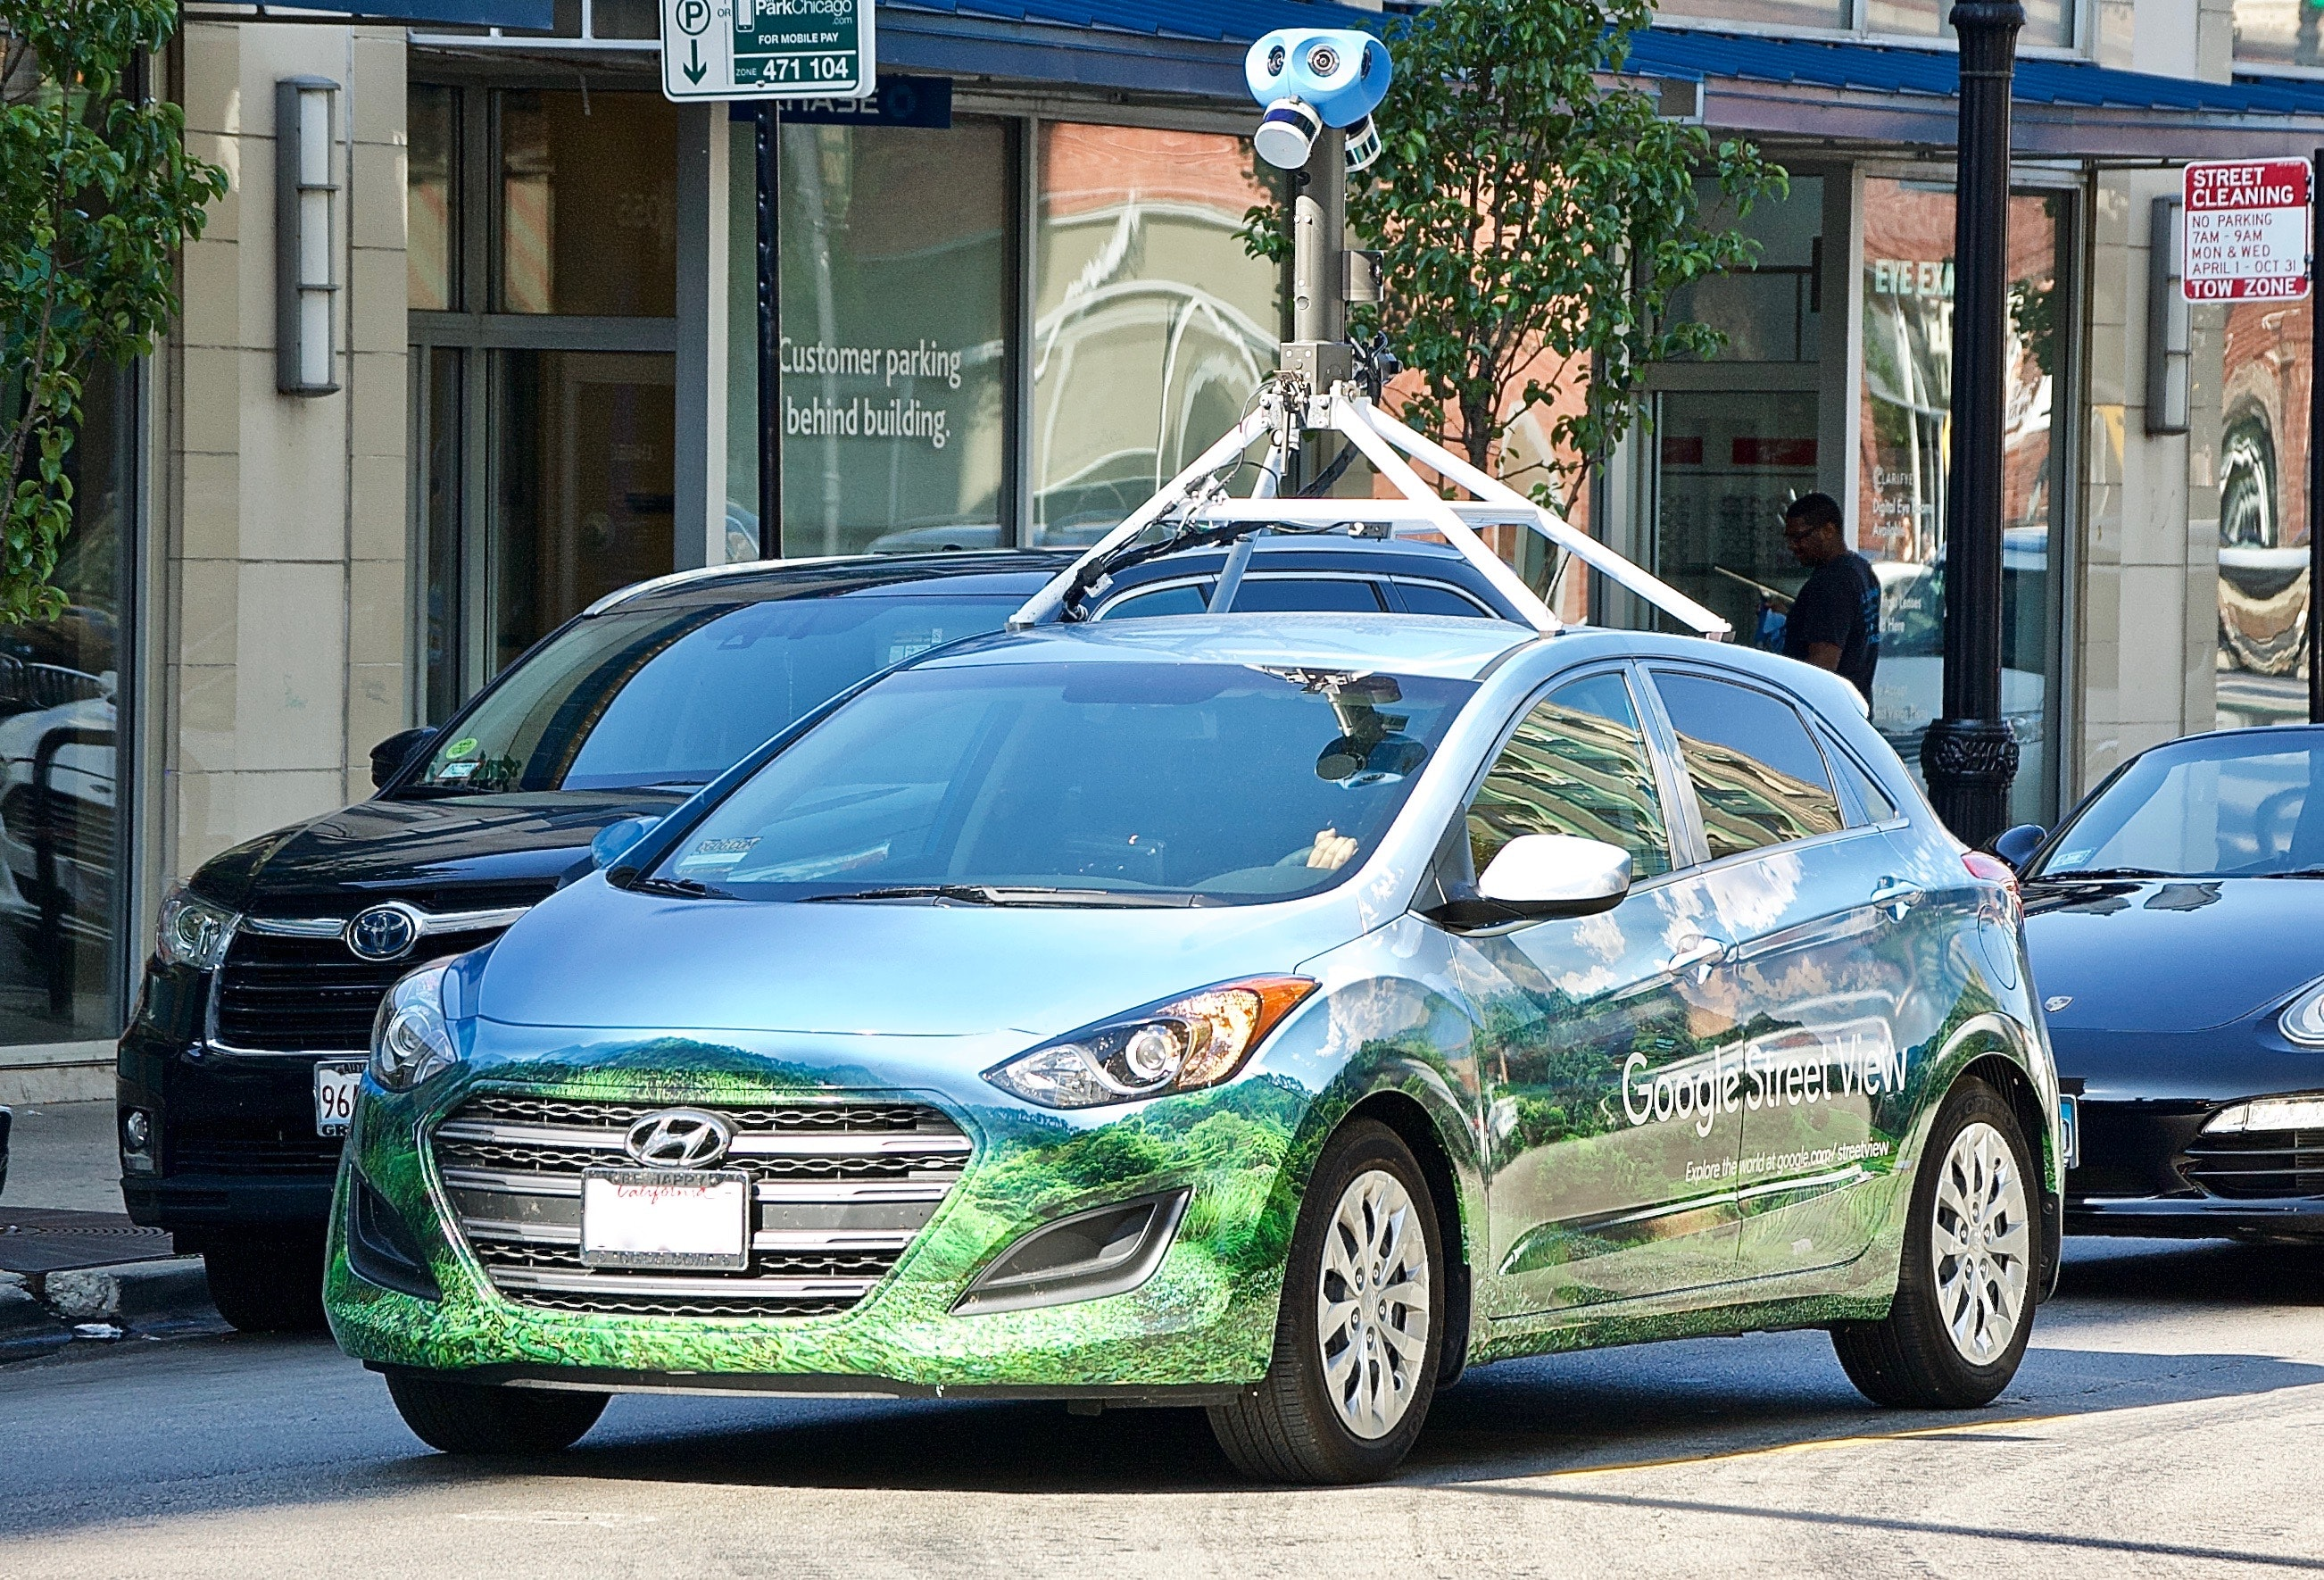 Free stock photo of Google map car